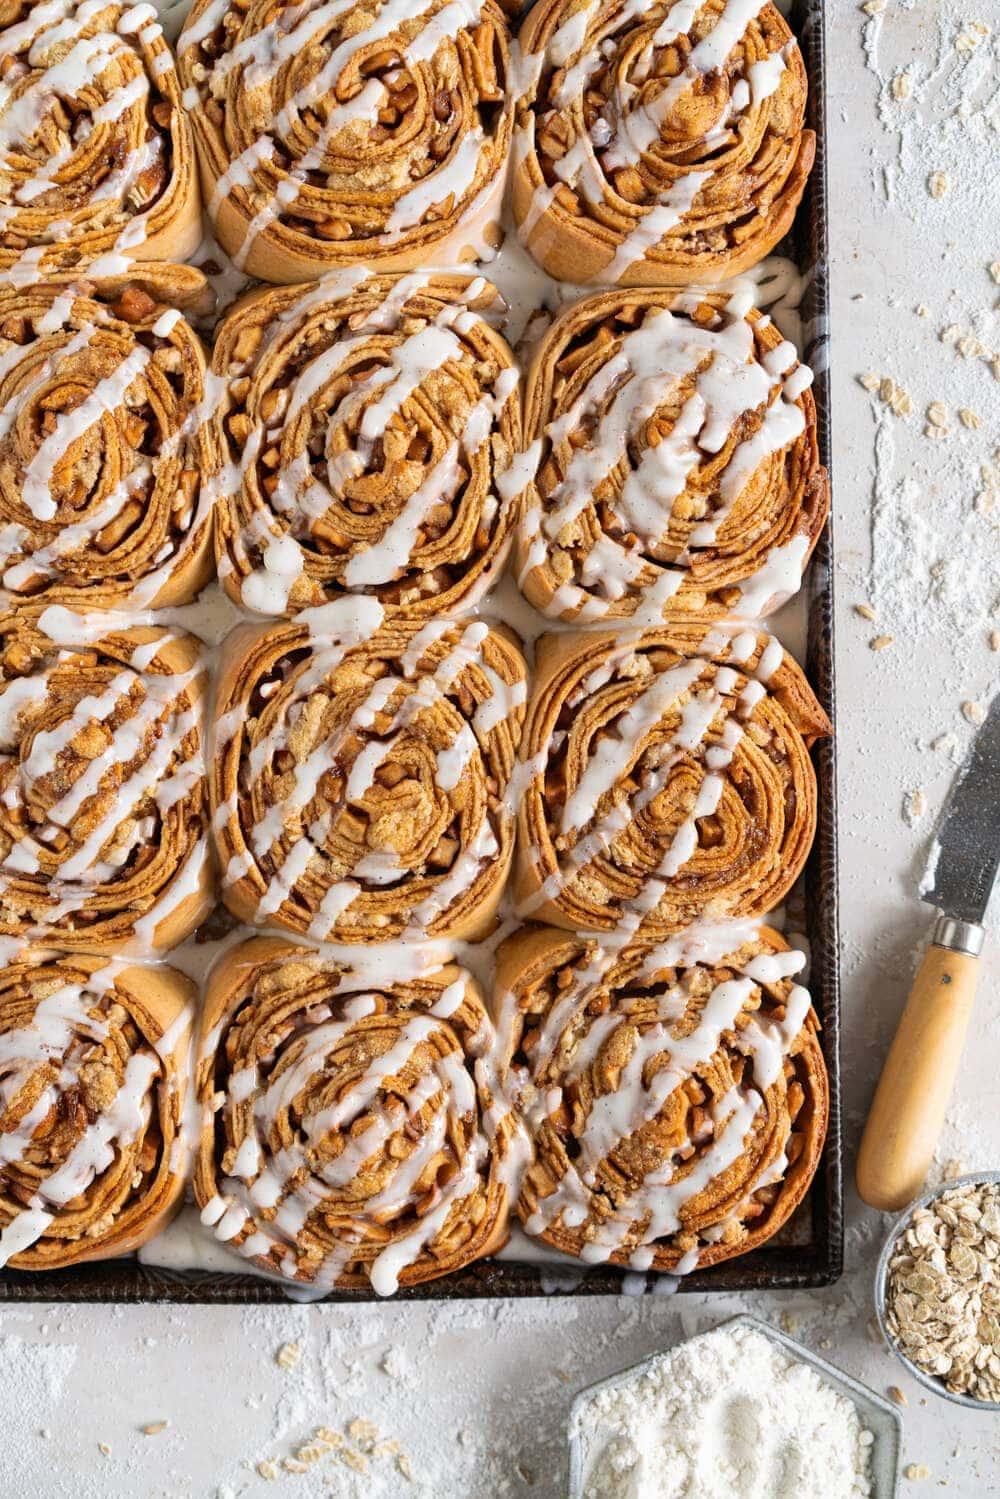 Apple cinnamon rolls with icing